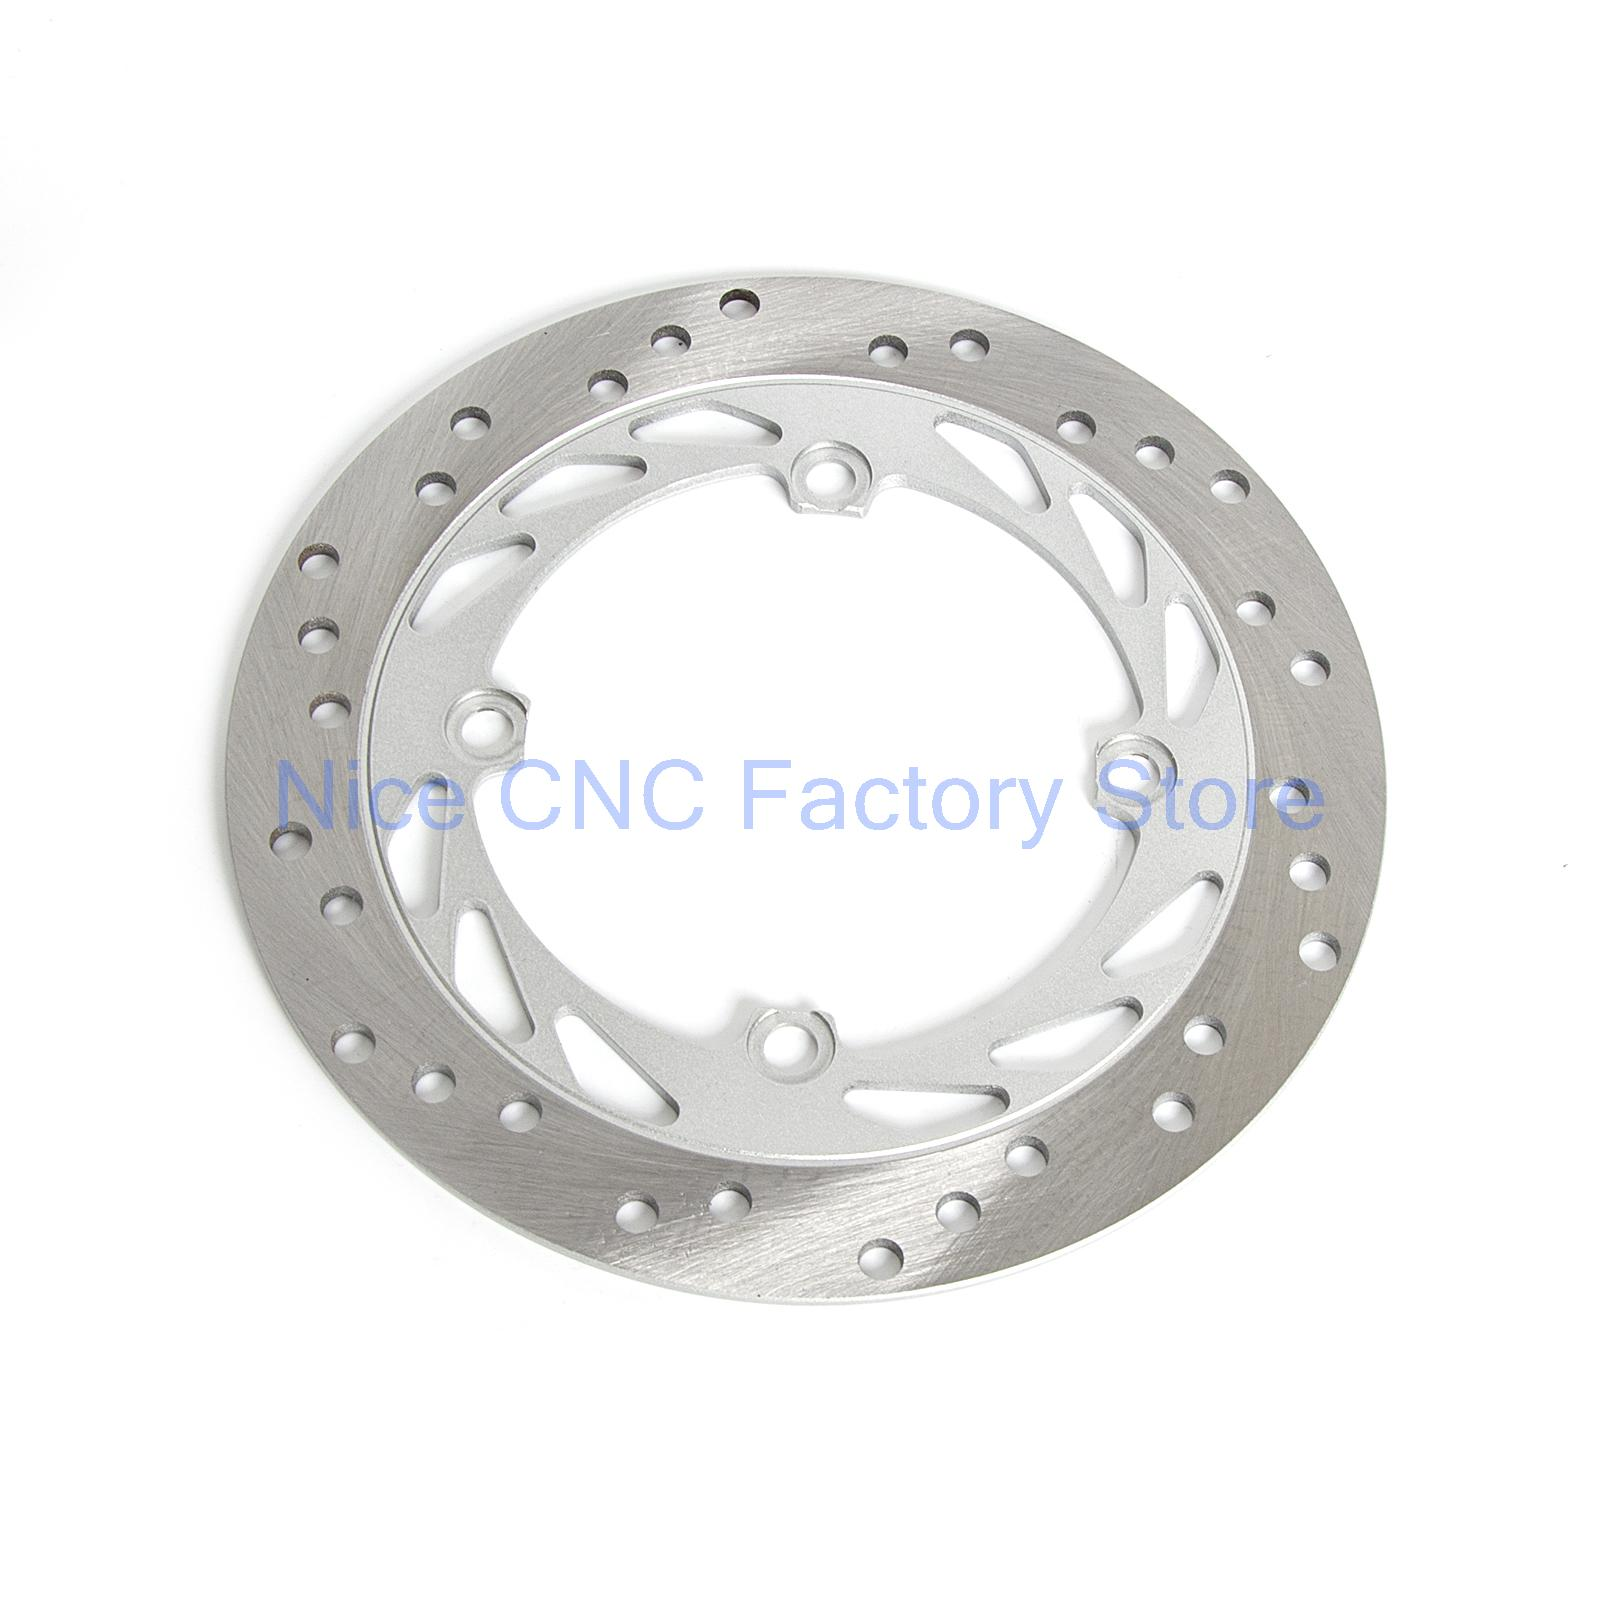 Motorcycle Front Rotor Brake Disc For Honda XR250 XR650 XR600 XR400 CR250 CR500 XL250 XLR250 AX-1 NX250 CRM250 CRF230 SL230<br><br>Aliexpress